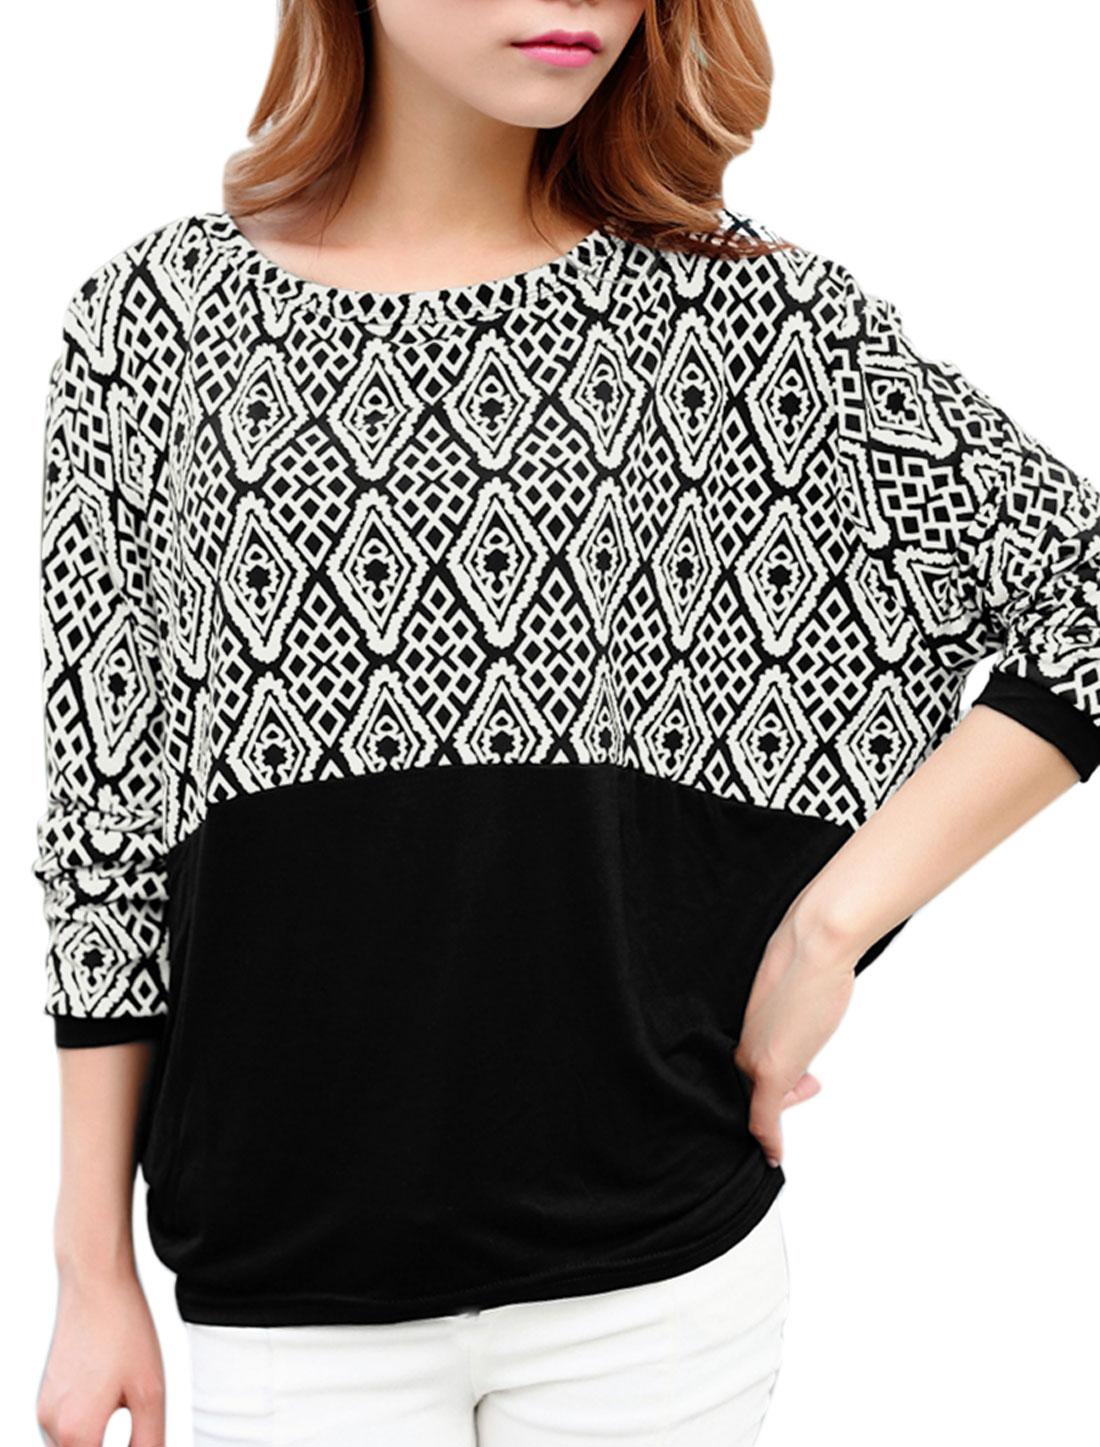 Women Argyle Pattern Long Batwing Sleeves Casual Shirt Black XS